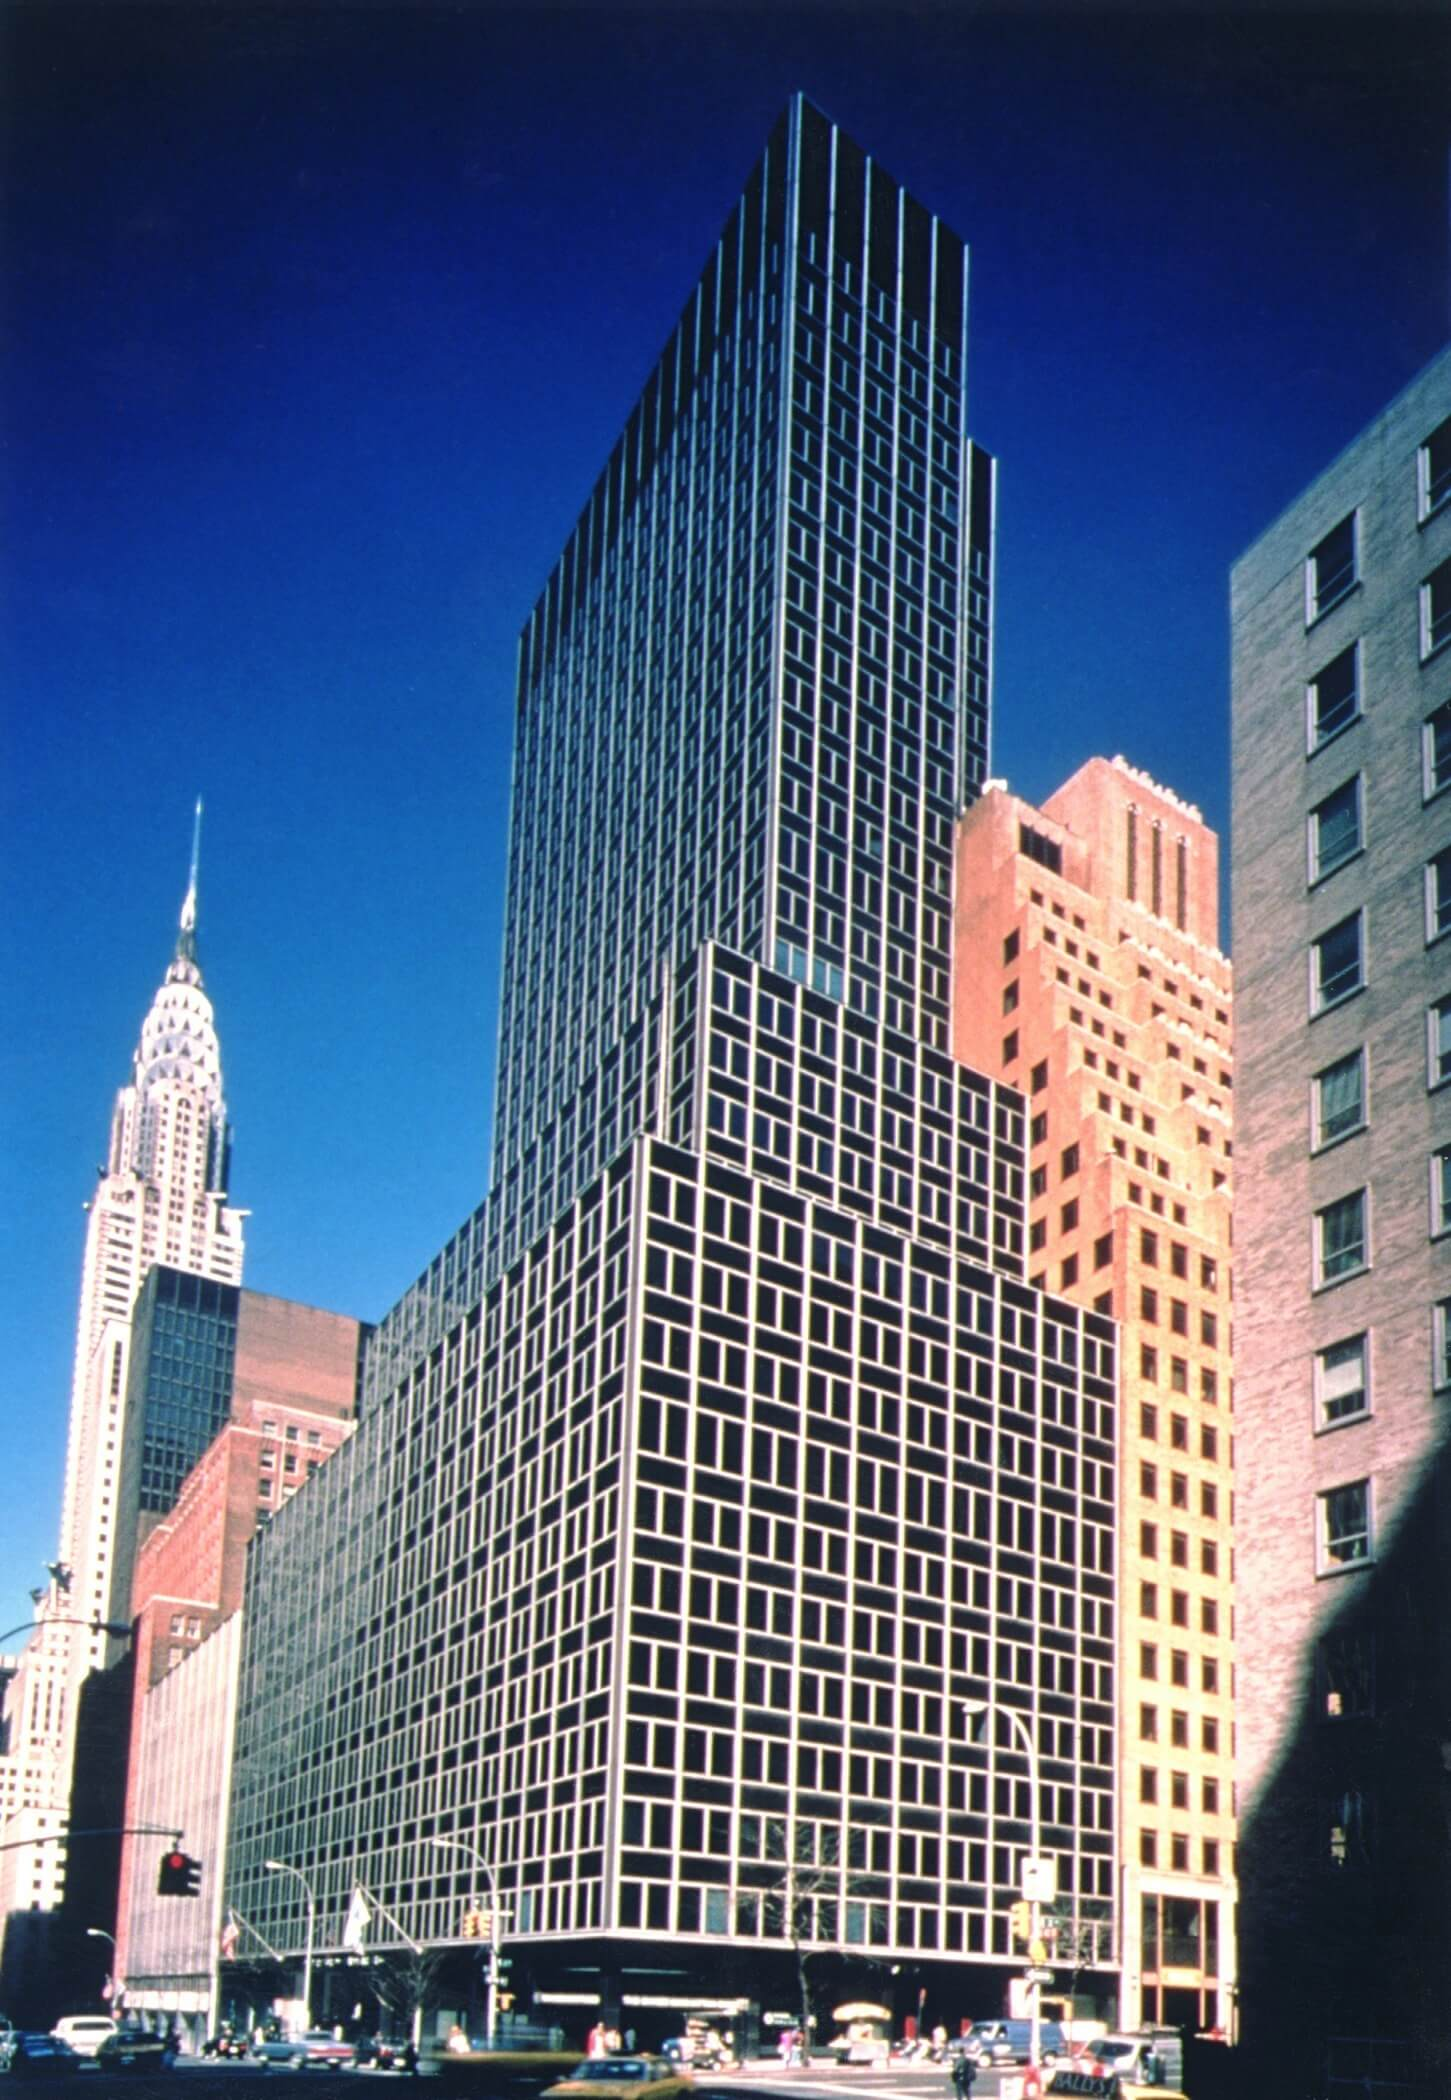 1961 HQ